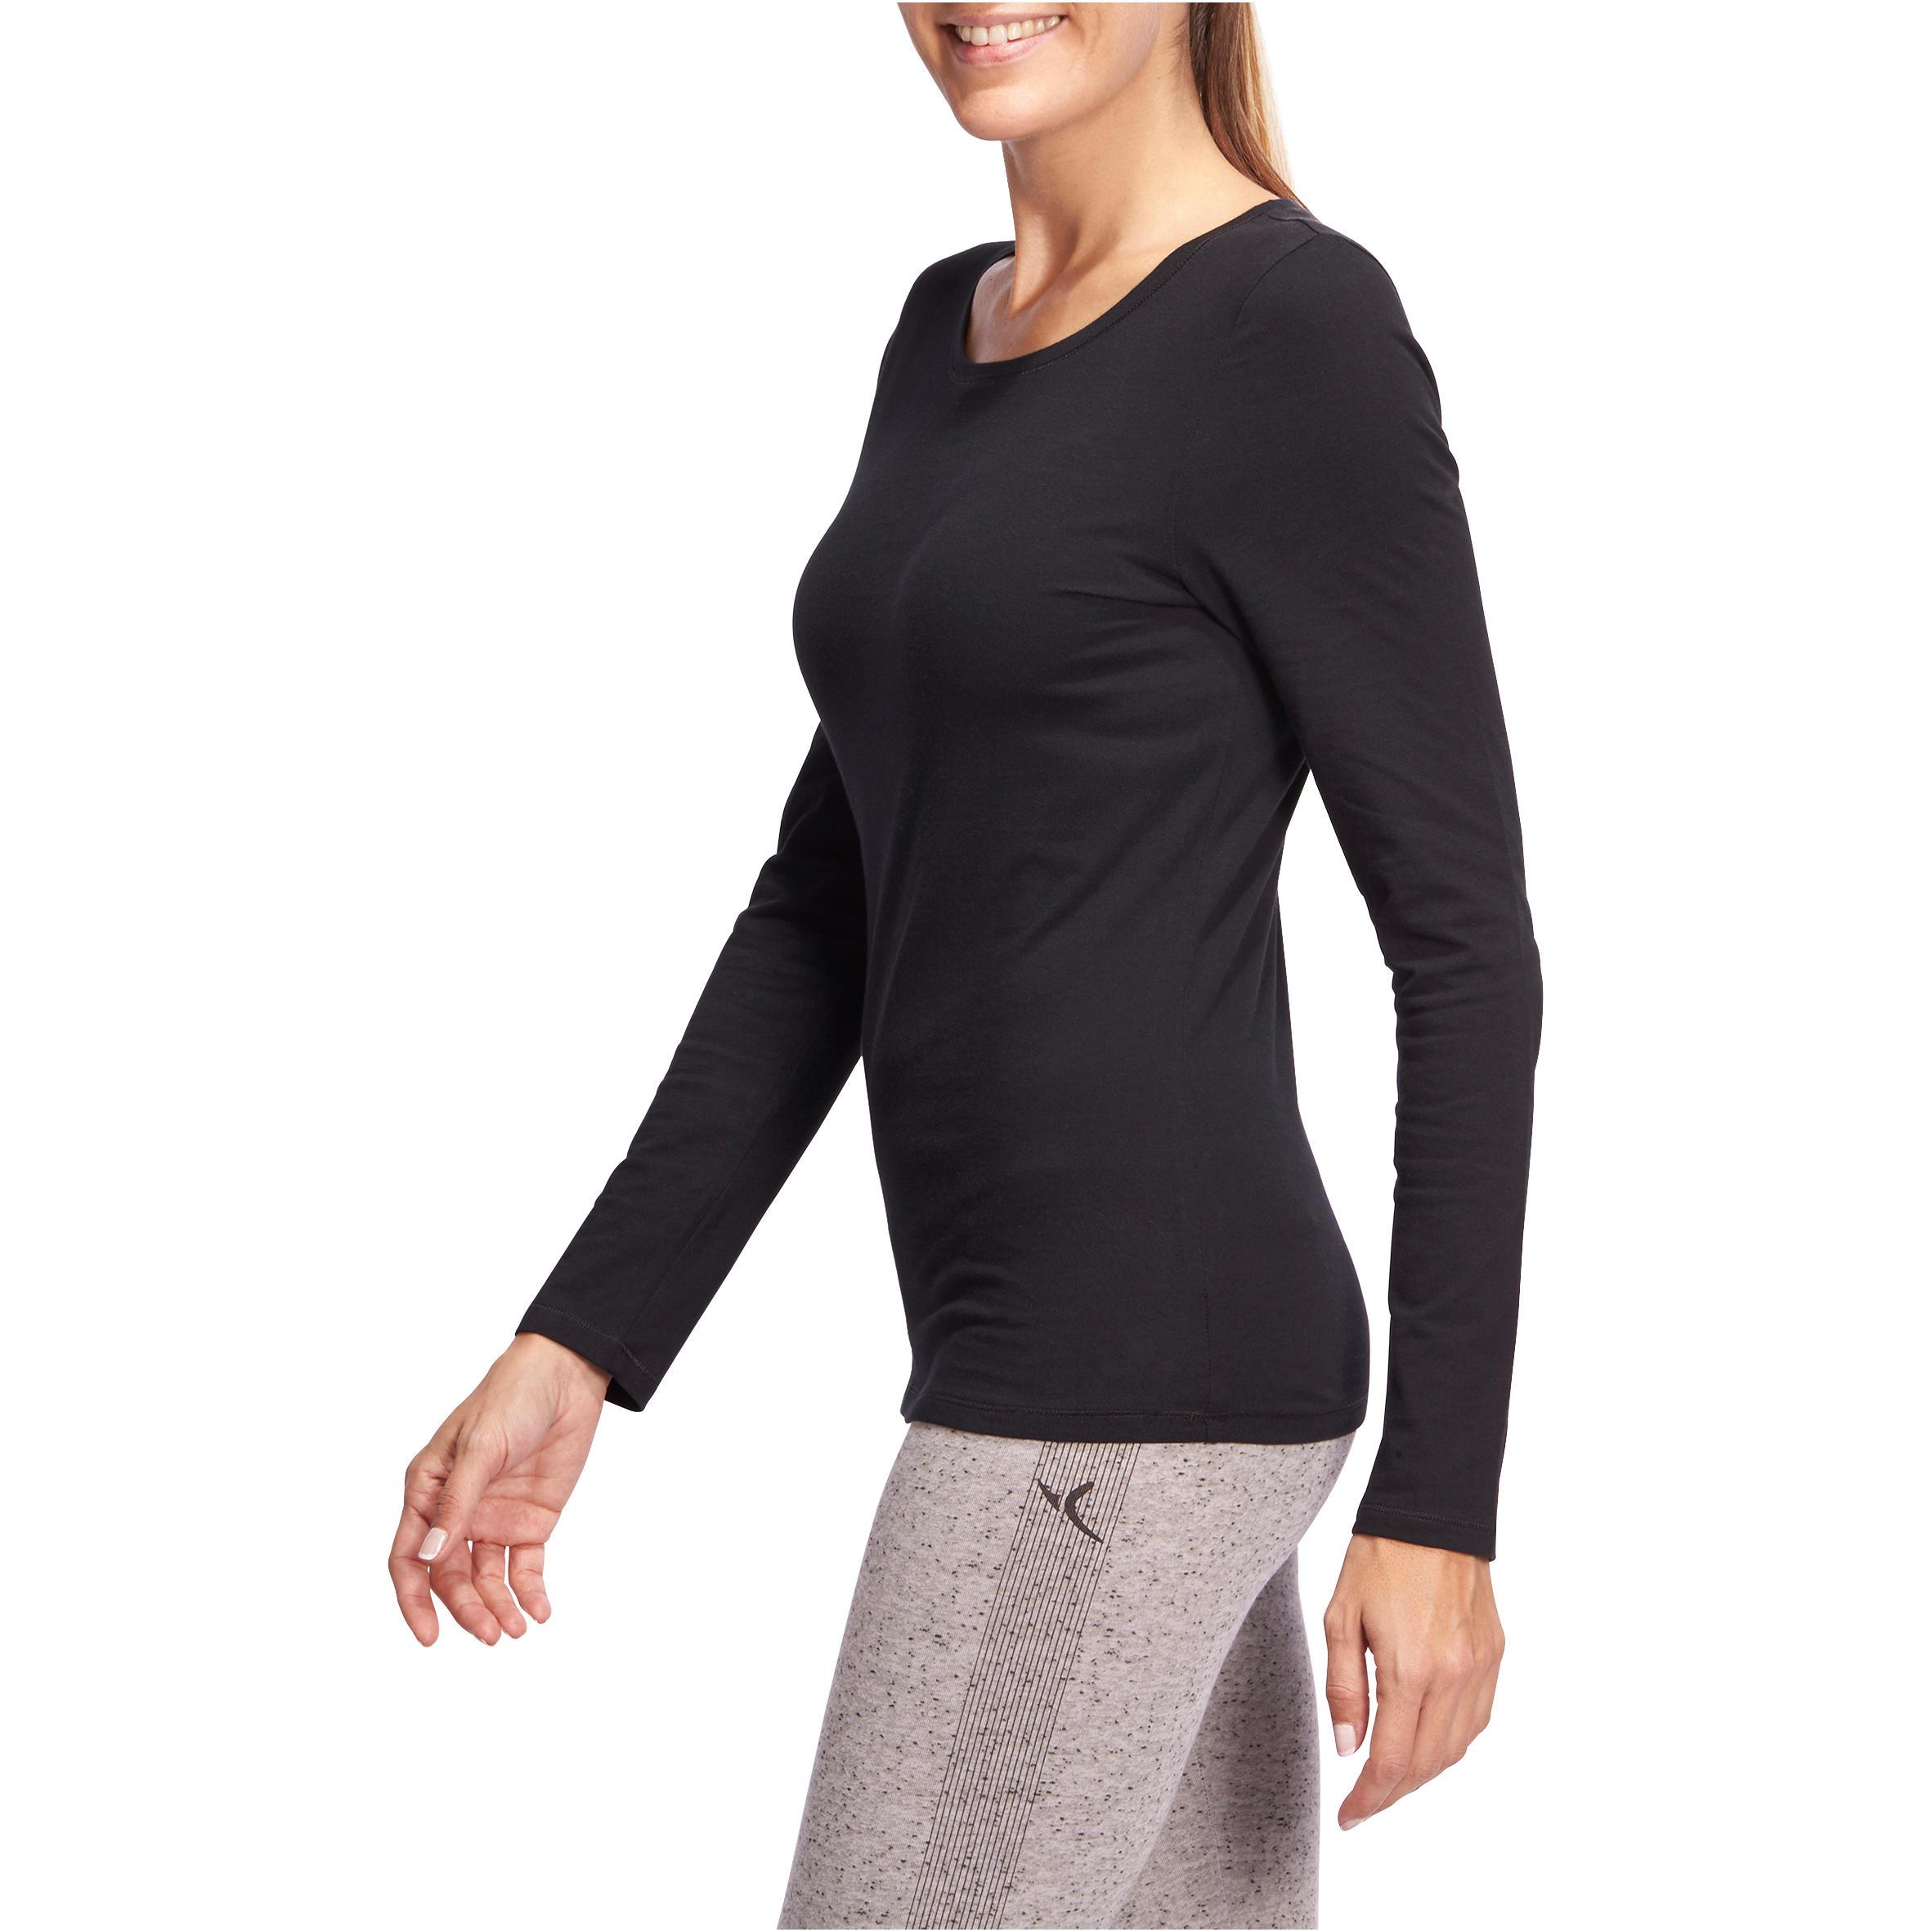 100 Women's Long-Sleeved Stretching T-Shirt - Black